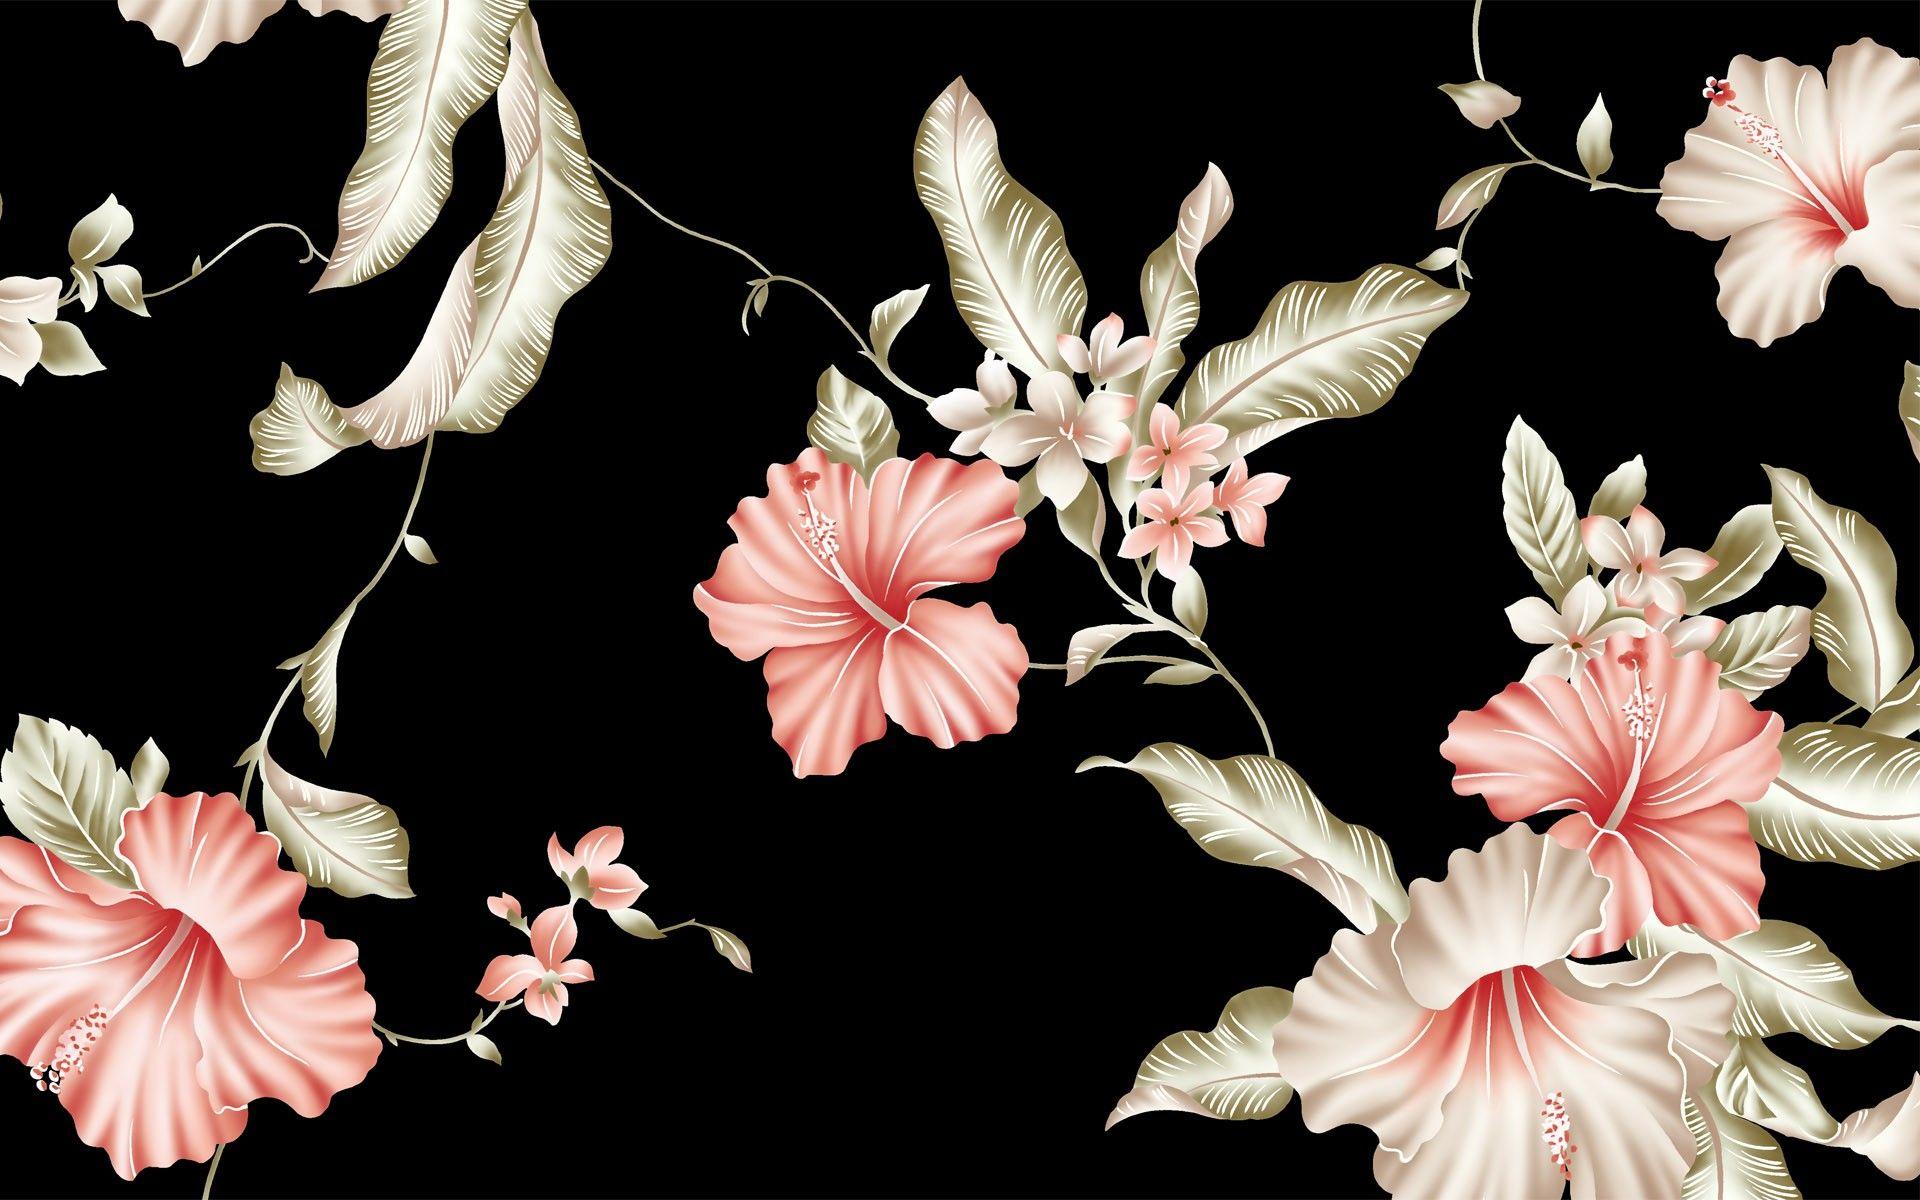 Vintage Flowers 14878 Vintage Flowers Wallpaper Cover Wallpaper